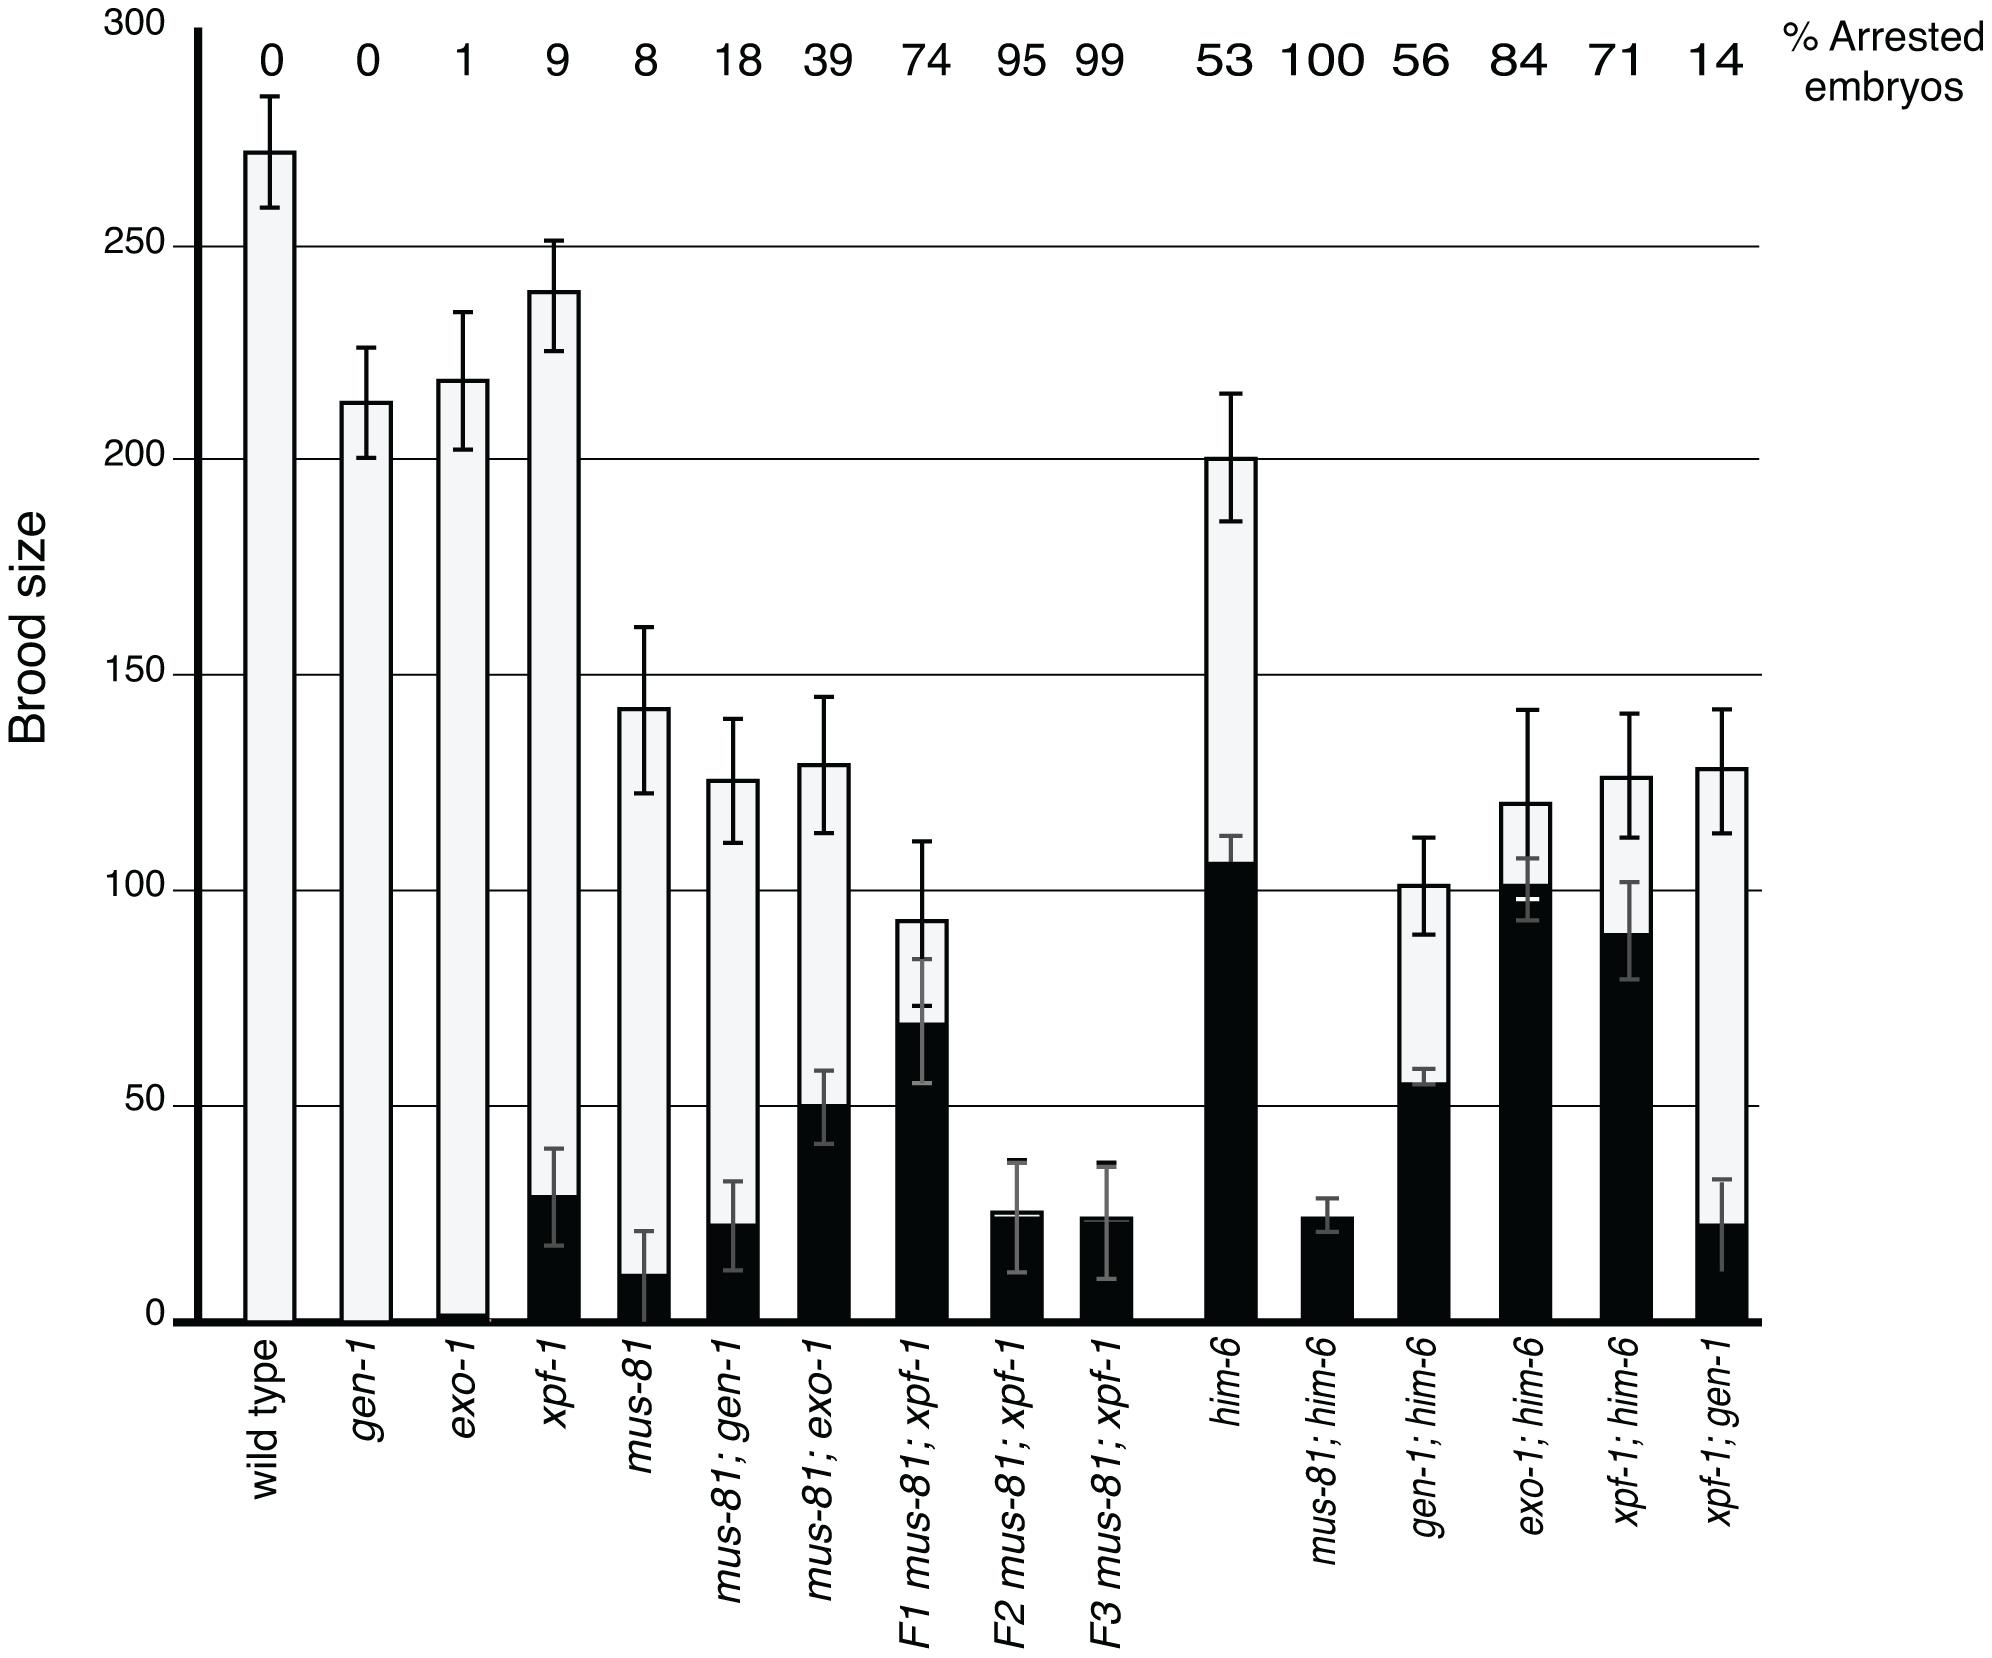 Brood analysis of <i>mus-81</i>, <i>him-6</i>, <i>xpf-1</i>, <i>exo-1</i>, <i>gen-1</i> and double mutants.